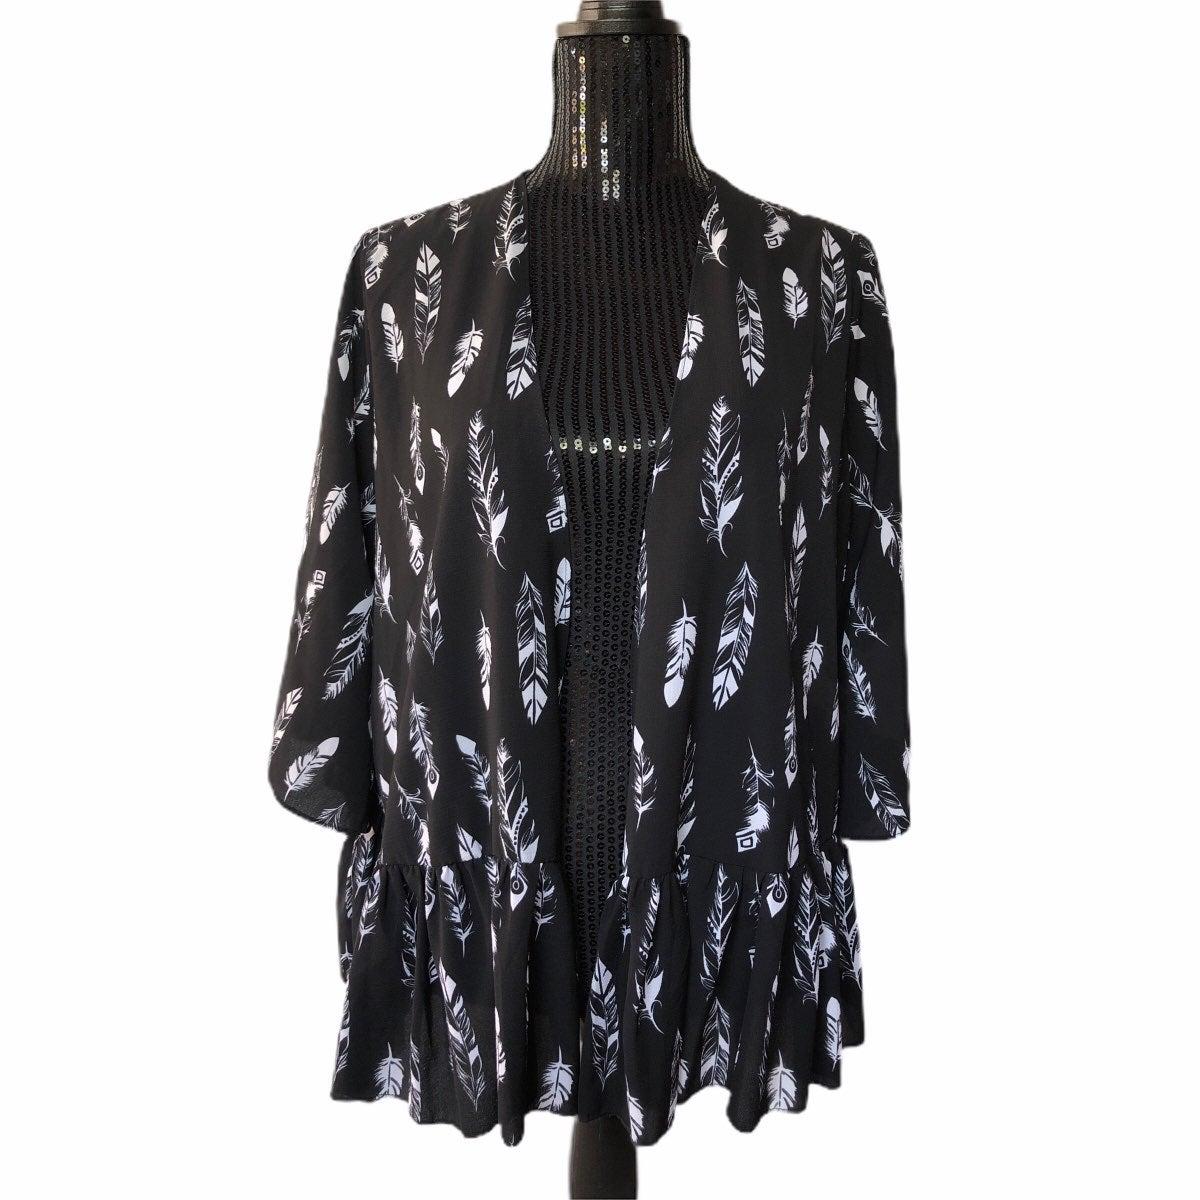 Normi 3/4 Bell Sleeve Kimono Blk/Feather